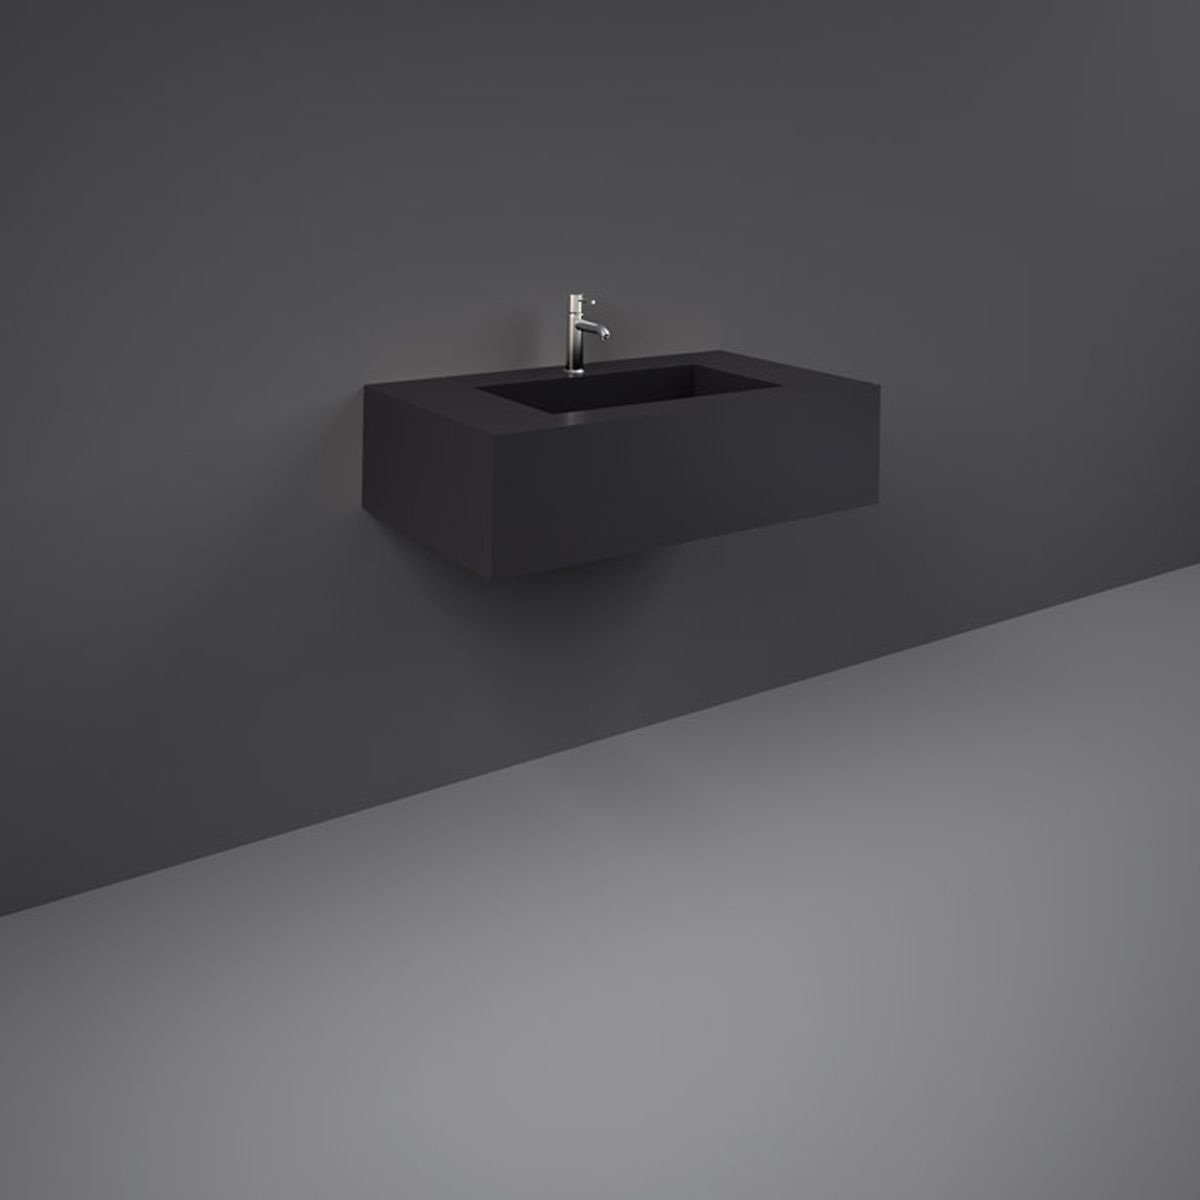 RAK Precious Uni Dark Black Wall Hung Counter Basin 800mm with Brackets